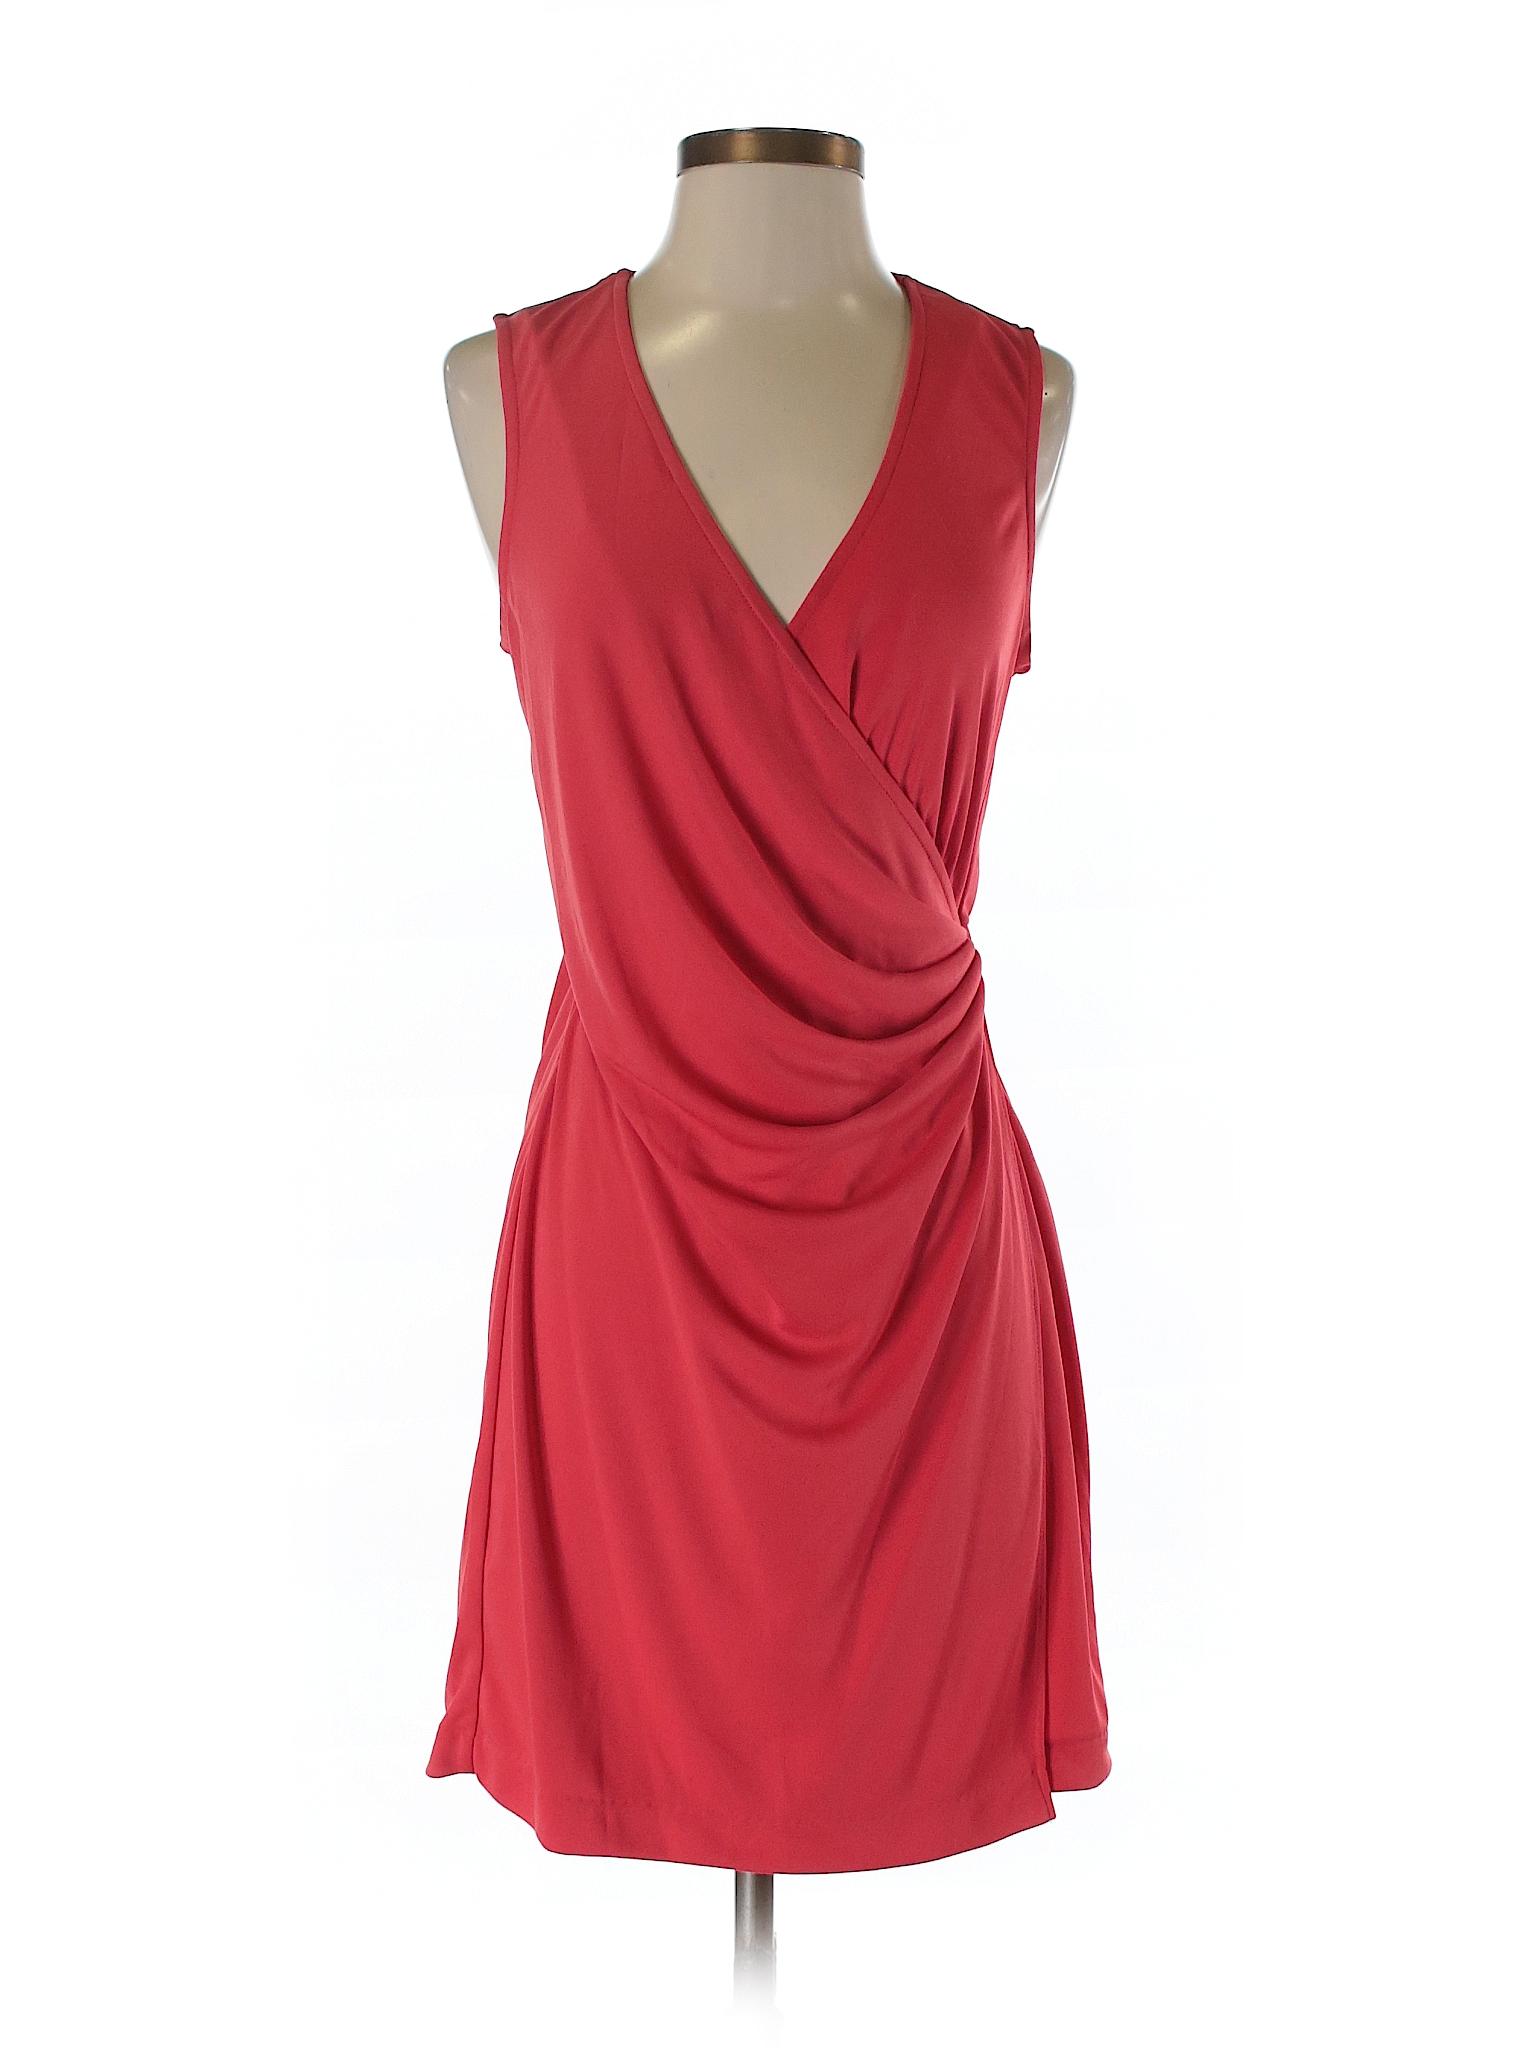 Casual By Dress Baker Walter W118 Boutique Winter wXxnqEpU